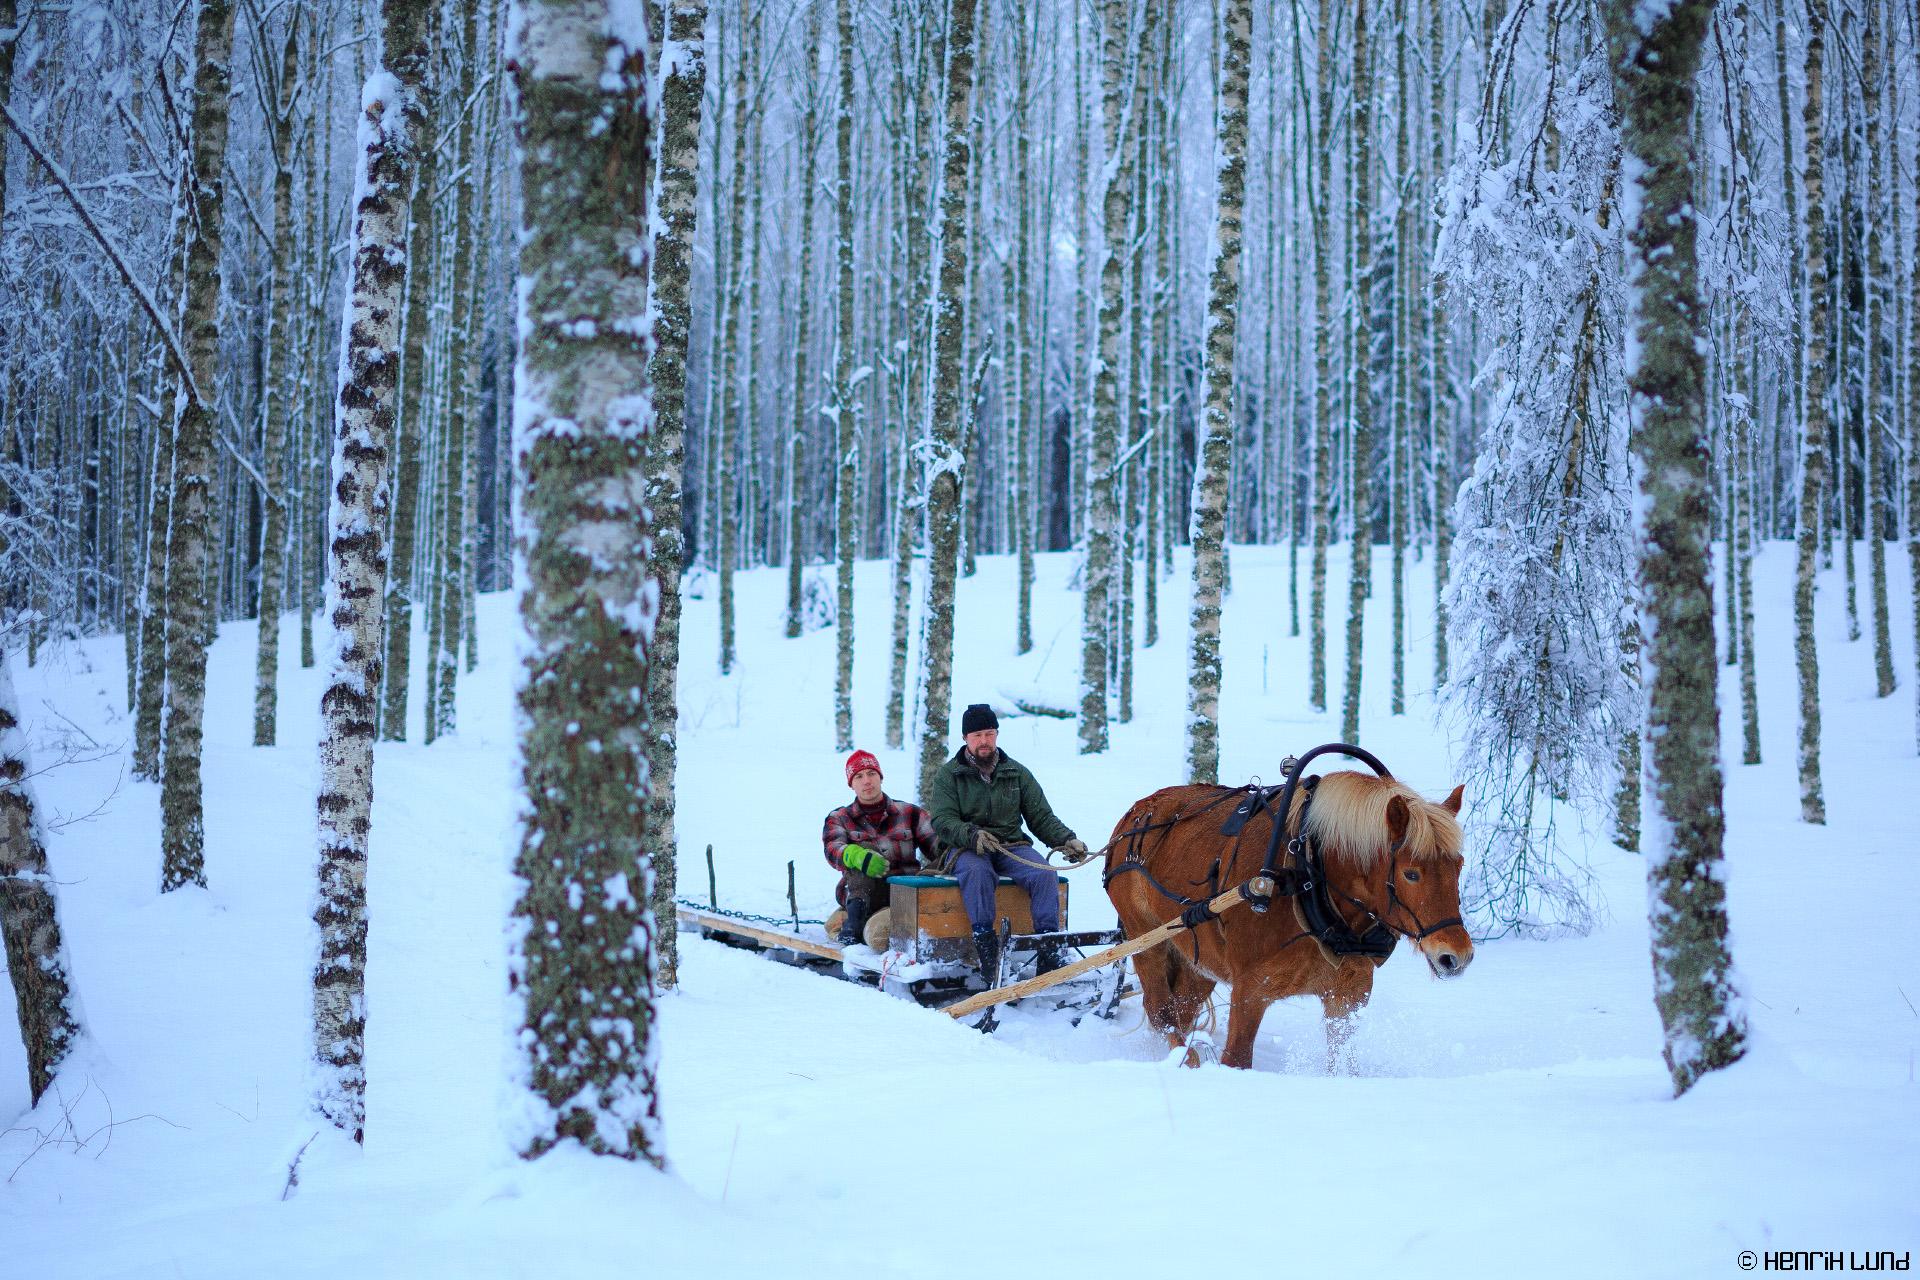 Forestry with horse - timbertransport. Mäntsälä, Finland, February, 2015.